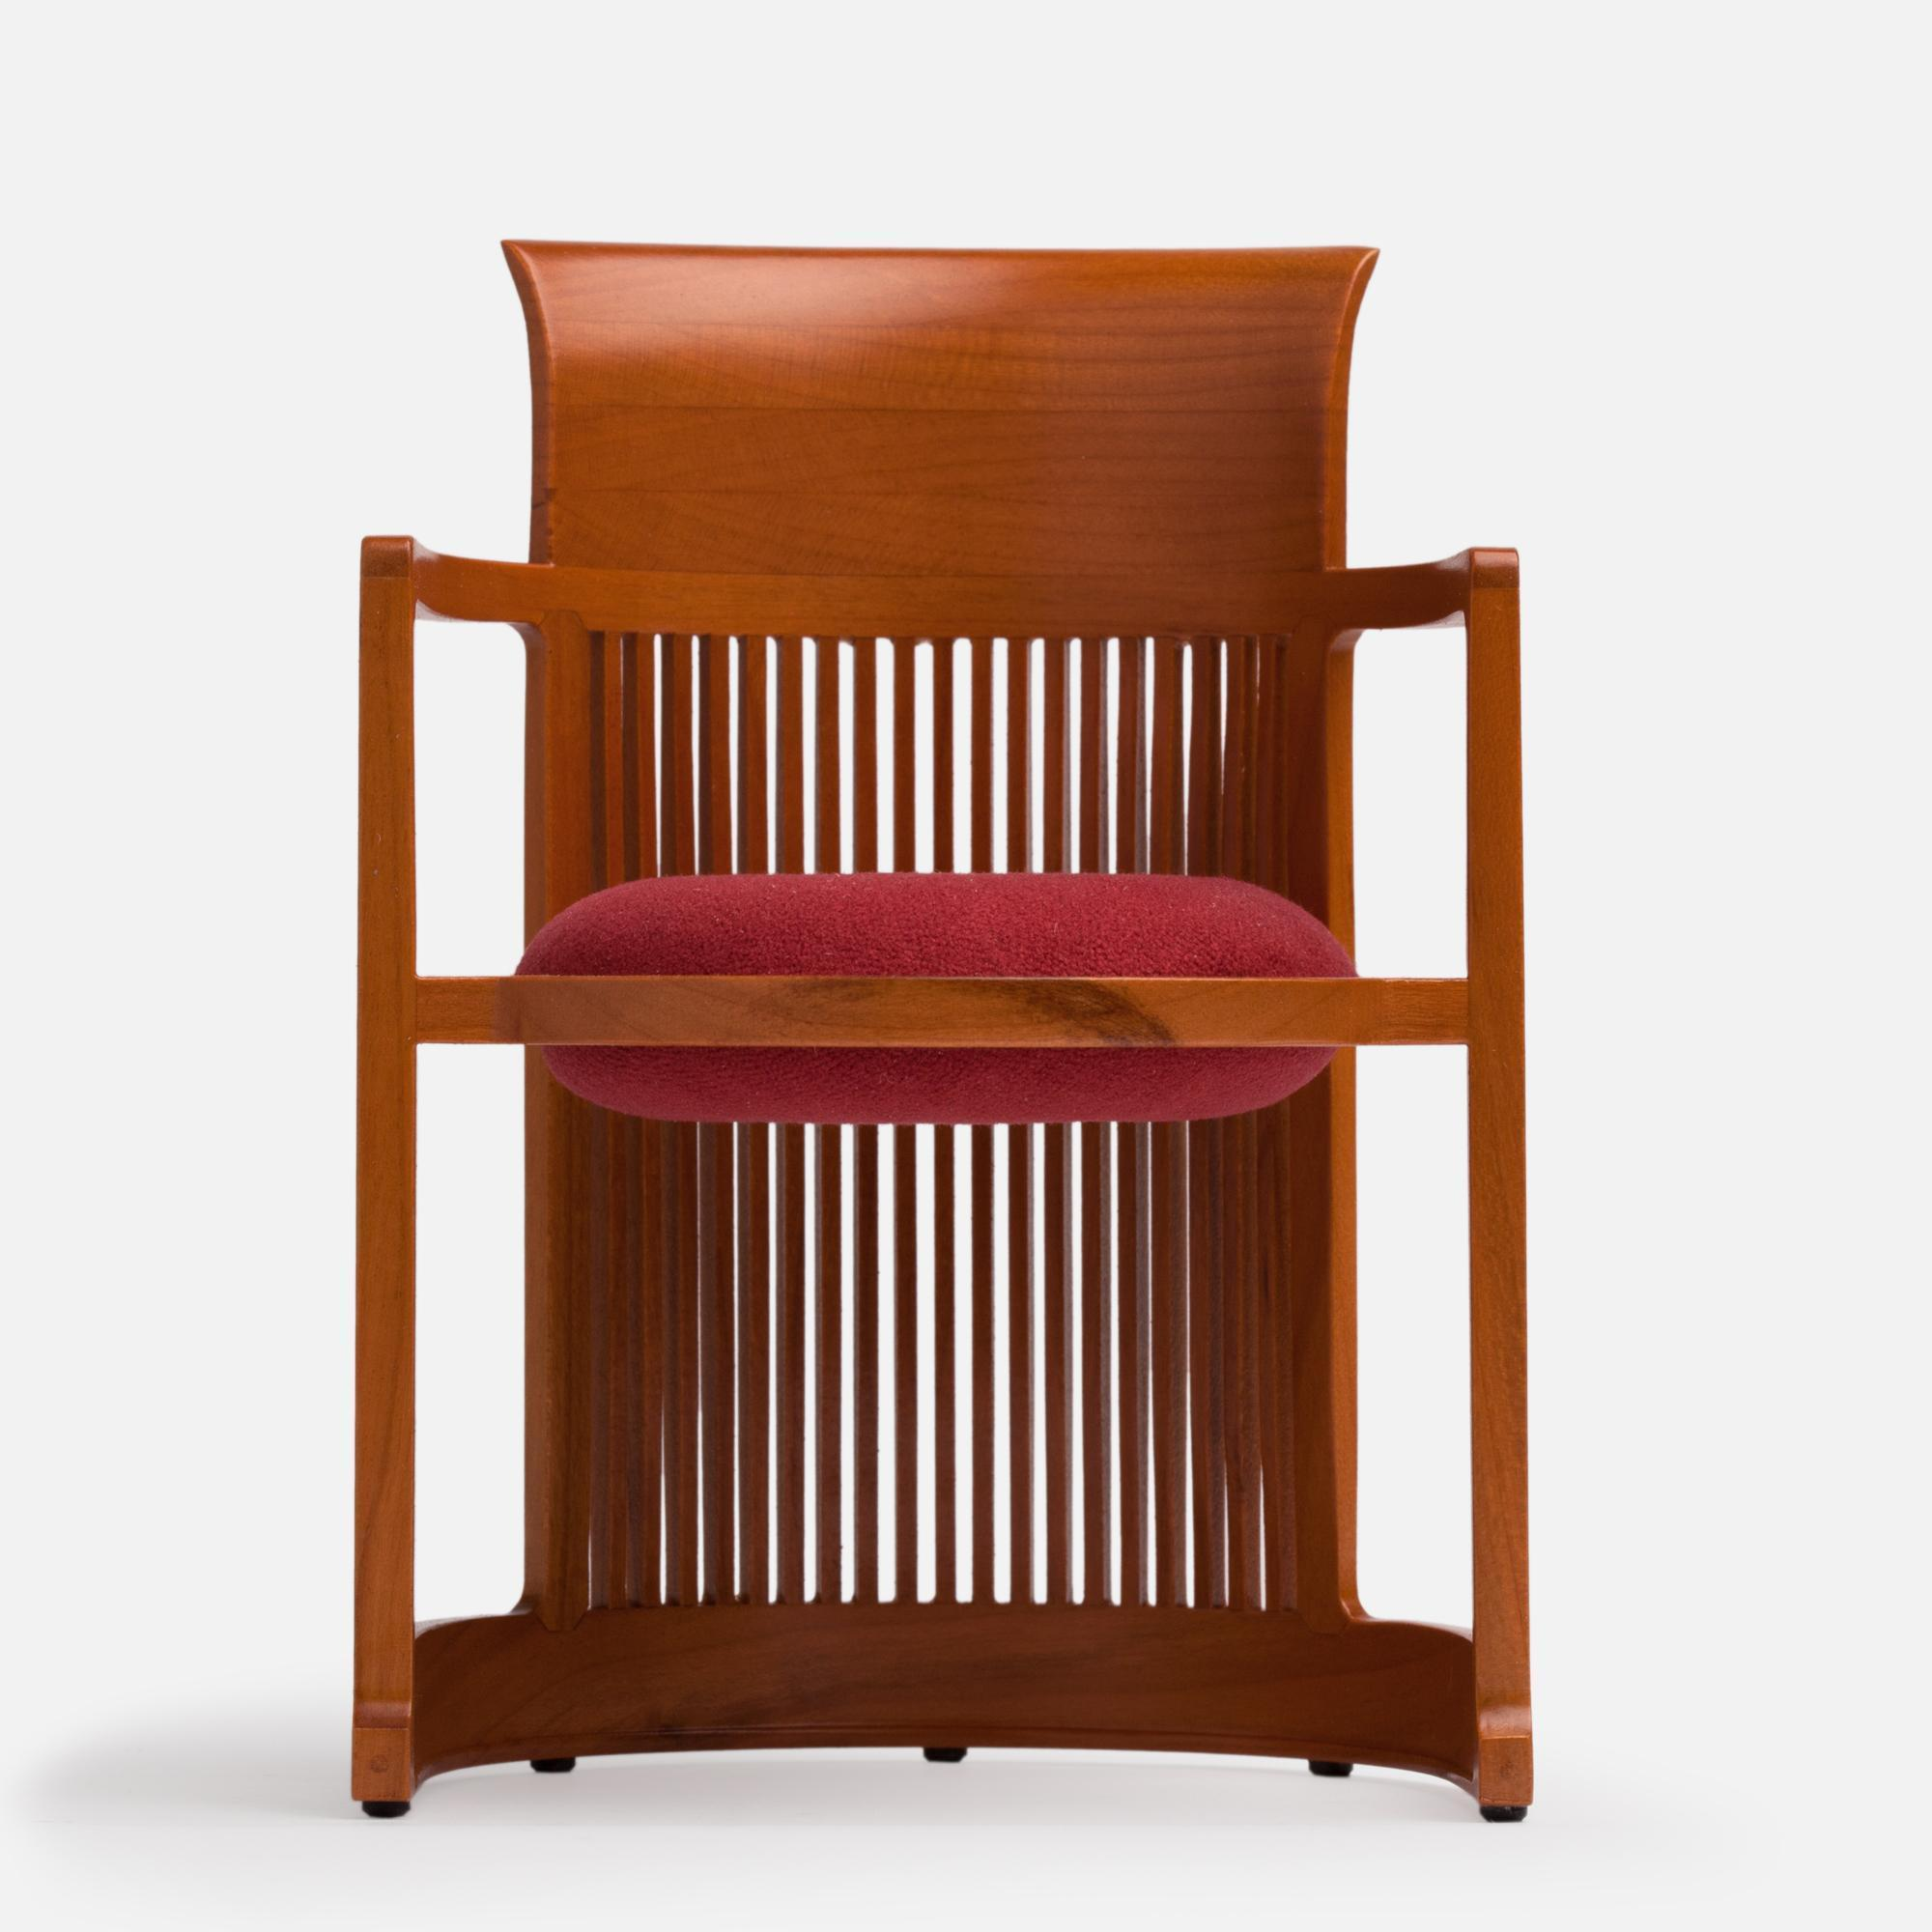 Miniature Frank Lloyd Wright's Barrel Chair, 1904